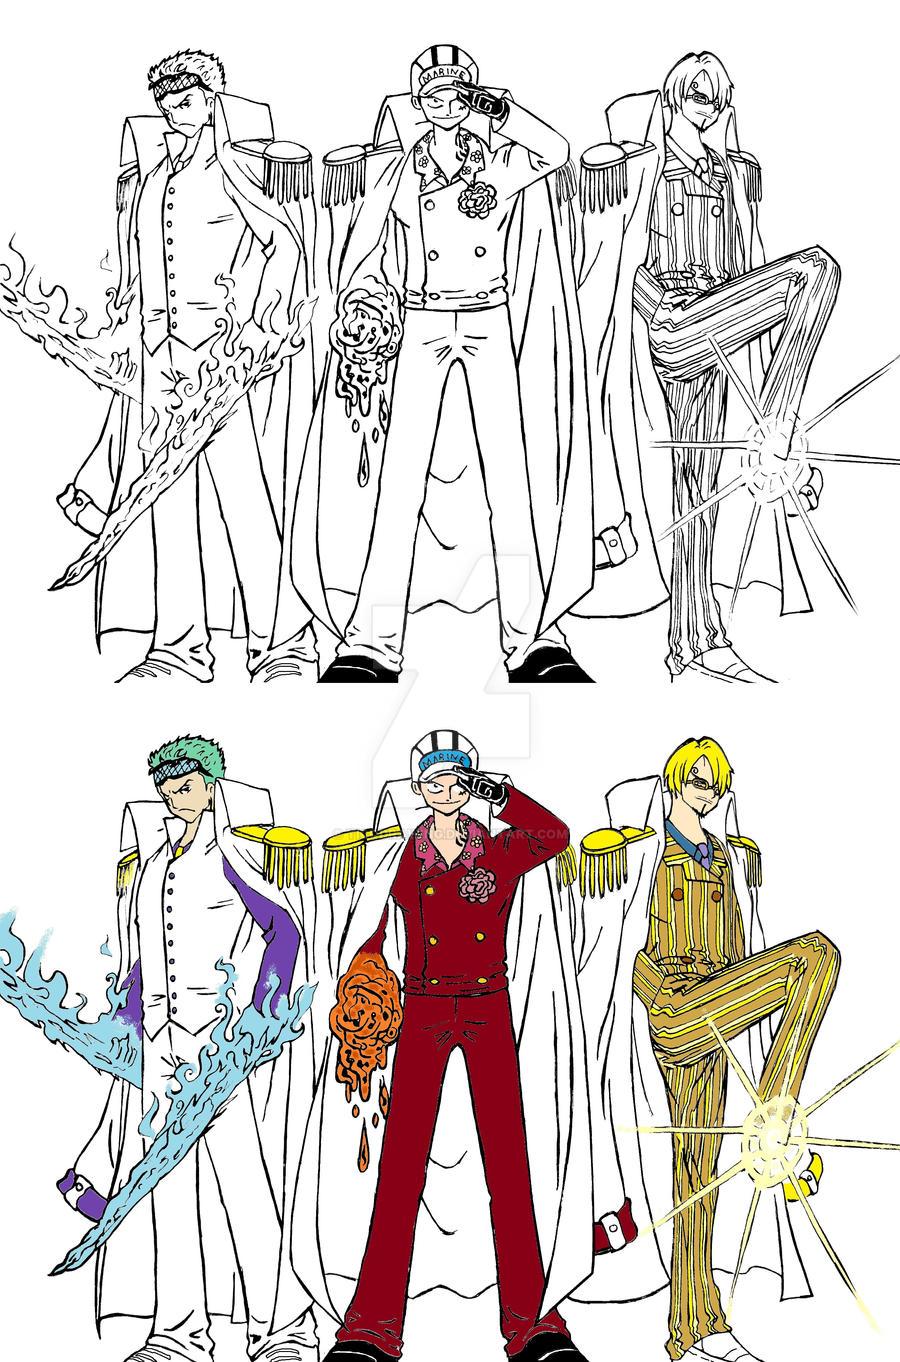 Luffy,Zoro and Sanji Admirals by TicoDrawing on DeviantArt  One